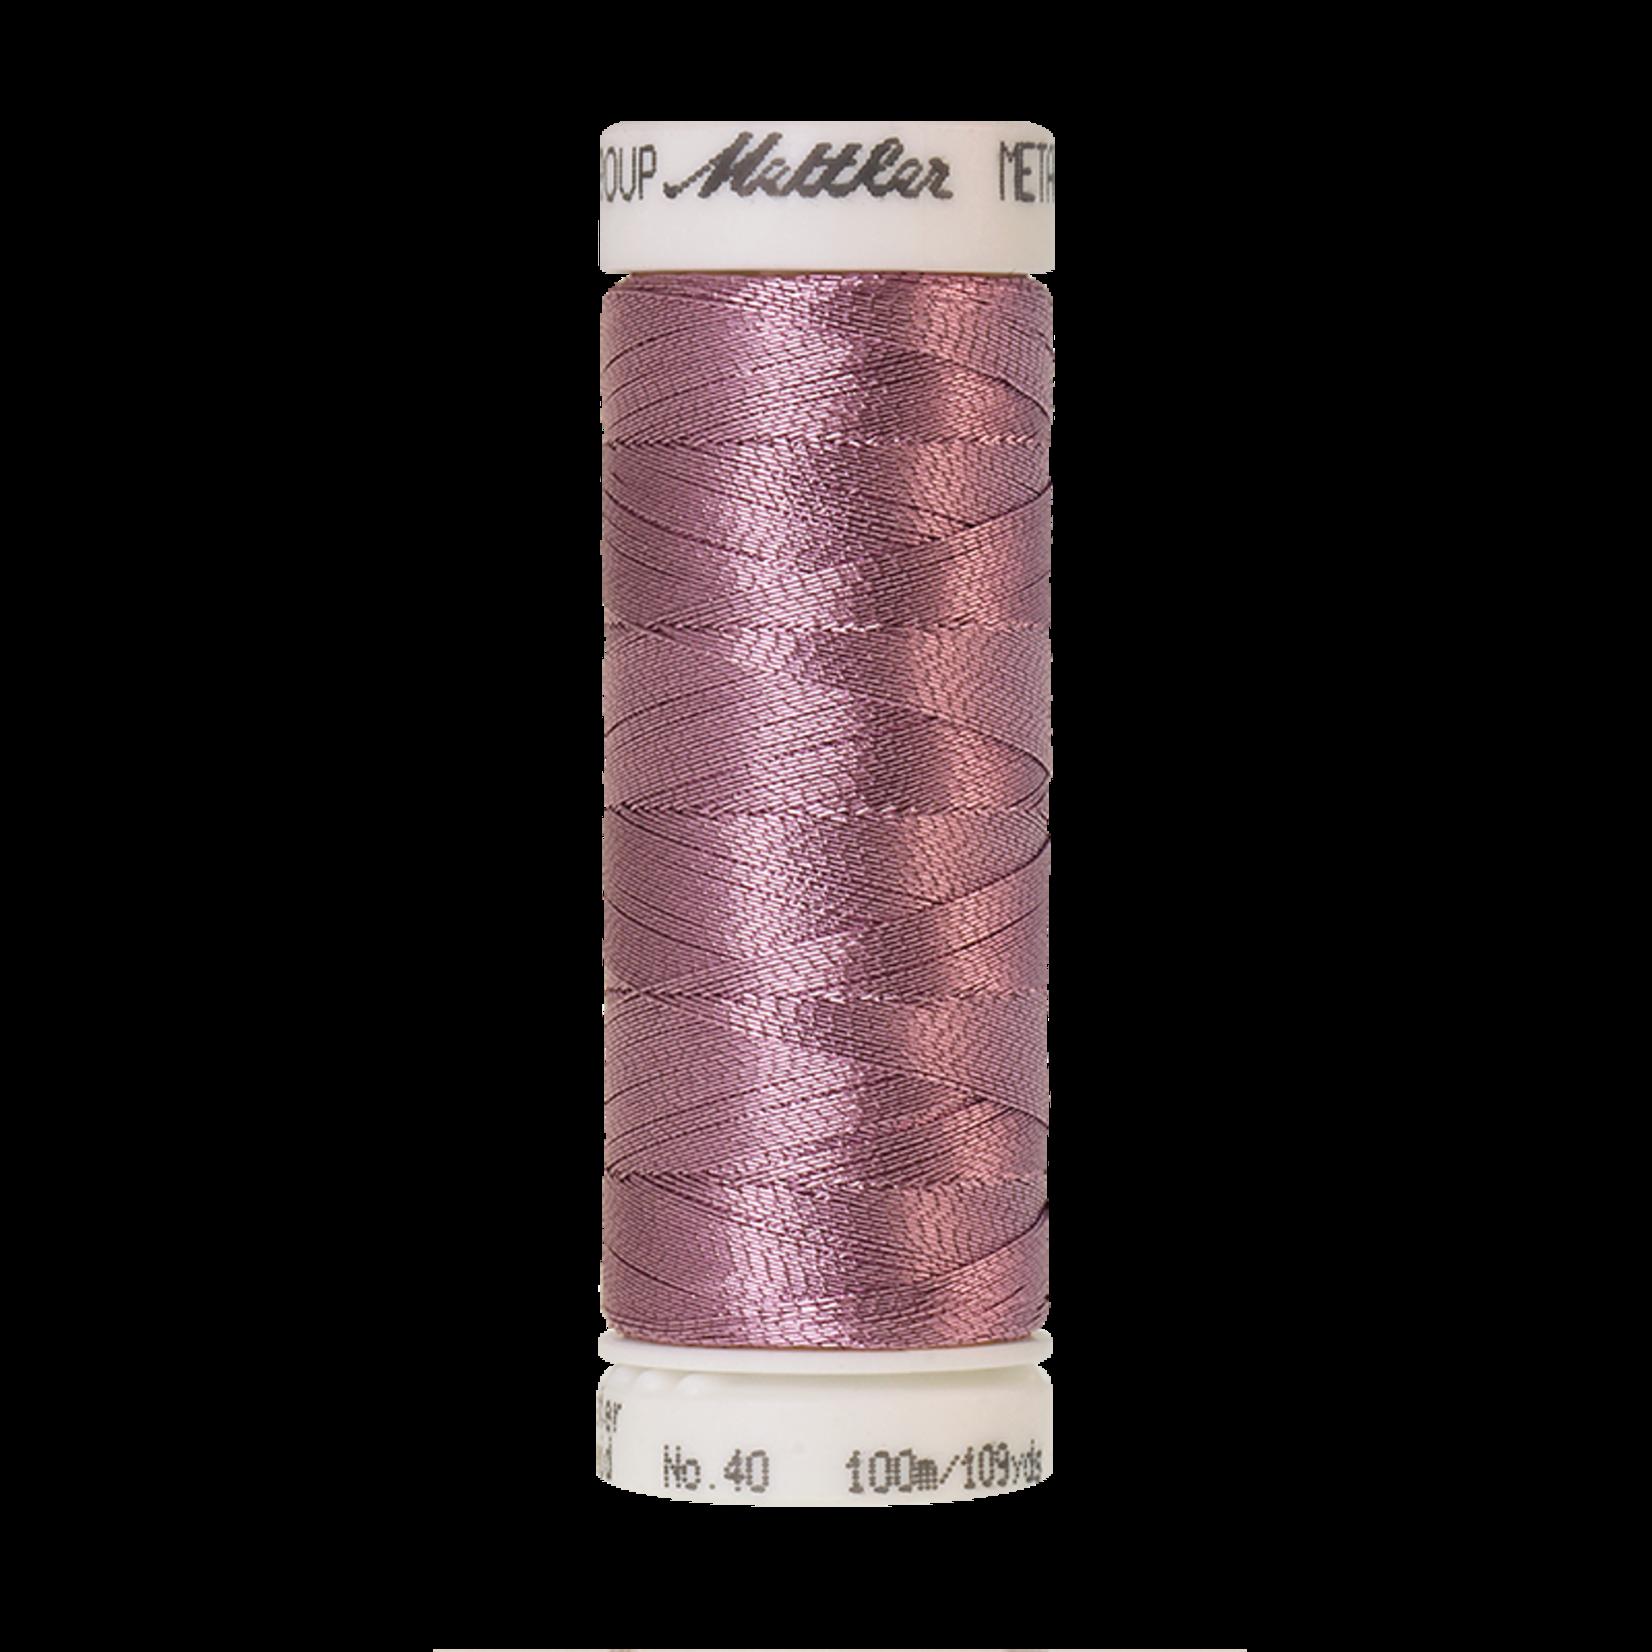 Amann Mettler Metallic - #40 - 100 m - 2830 Bright Amethyst